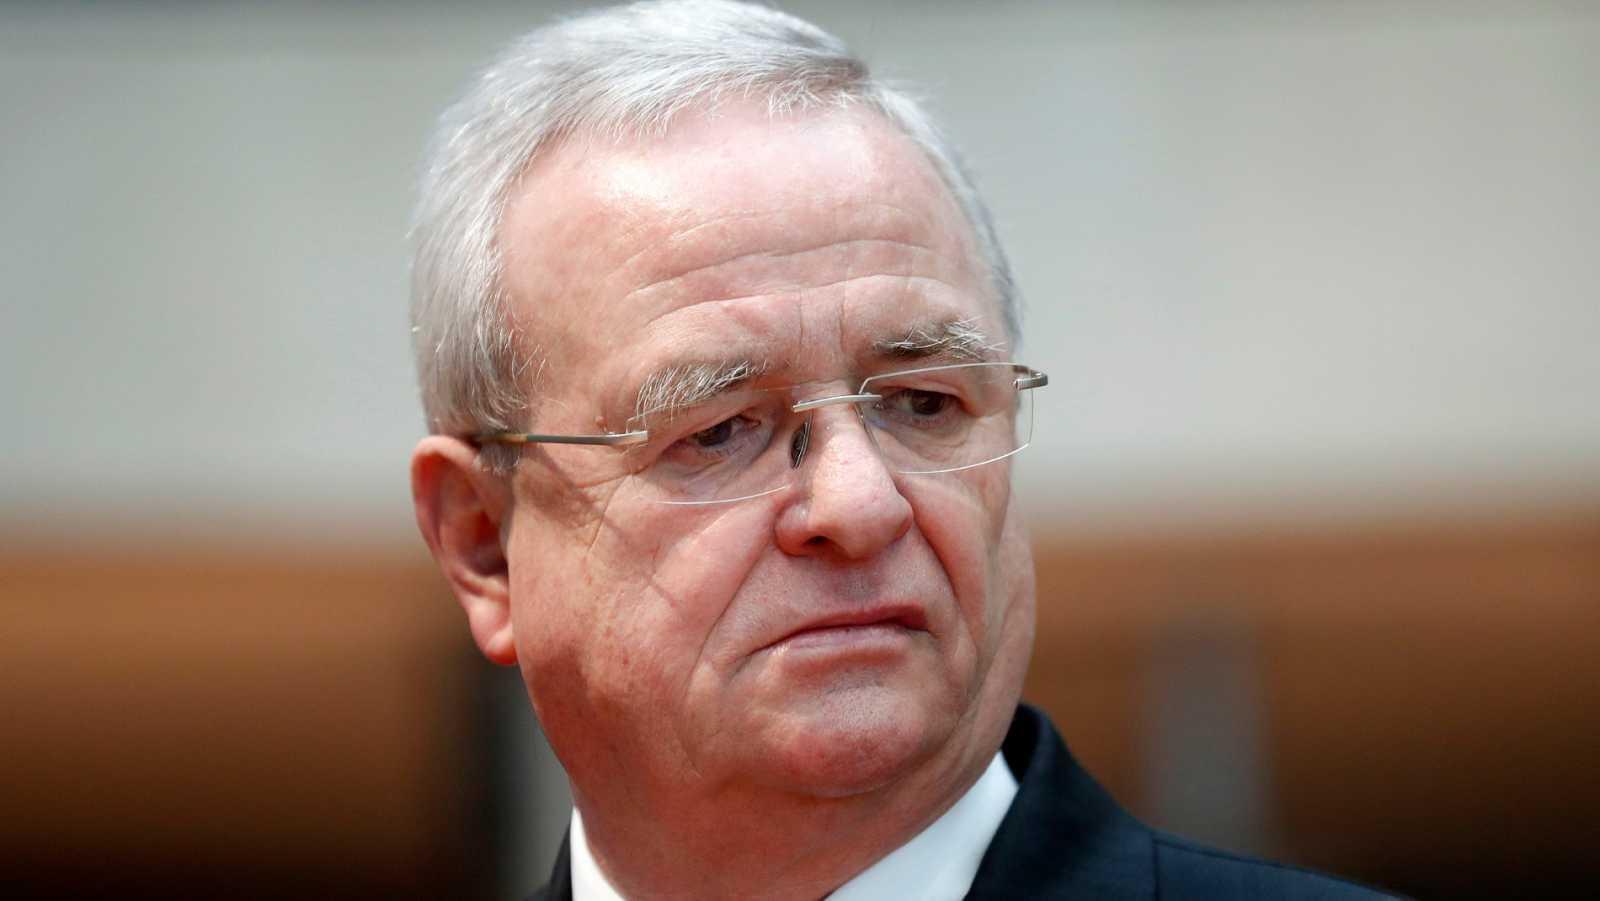 El expresidente de Volkswagen, Martin Winterkorn